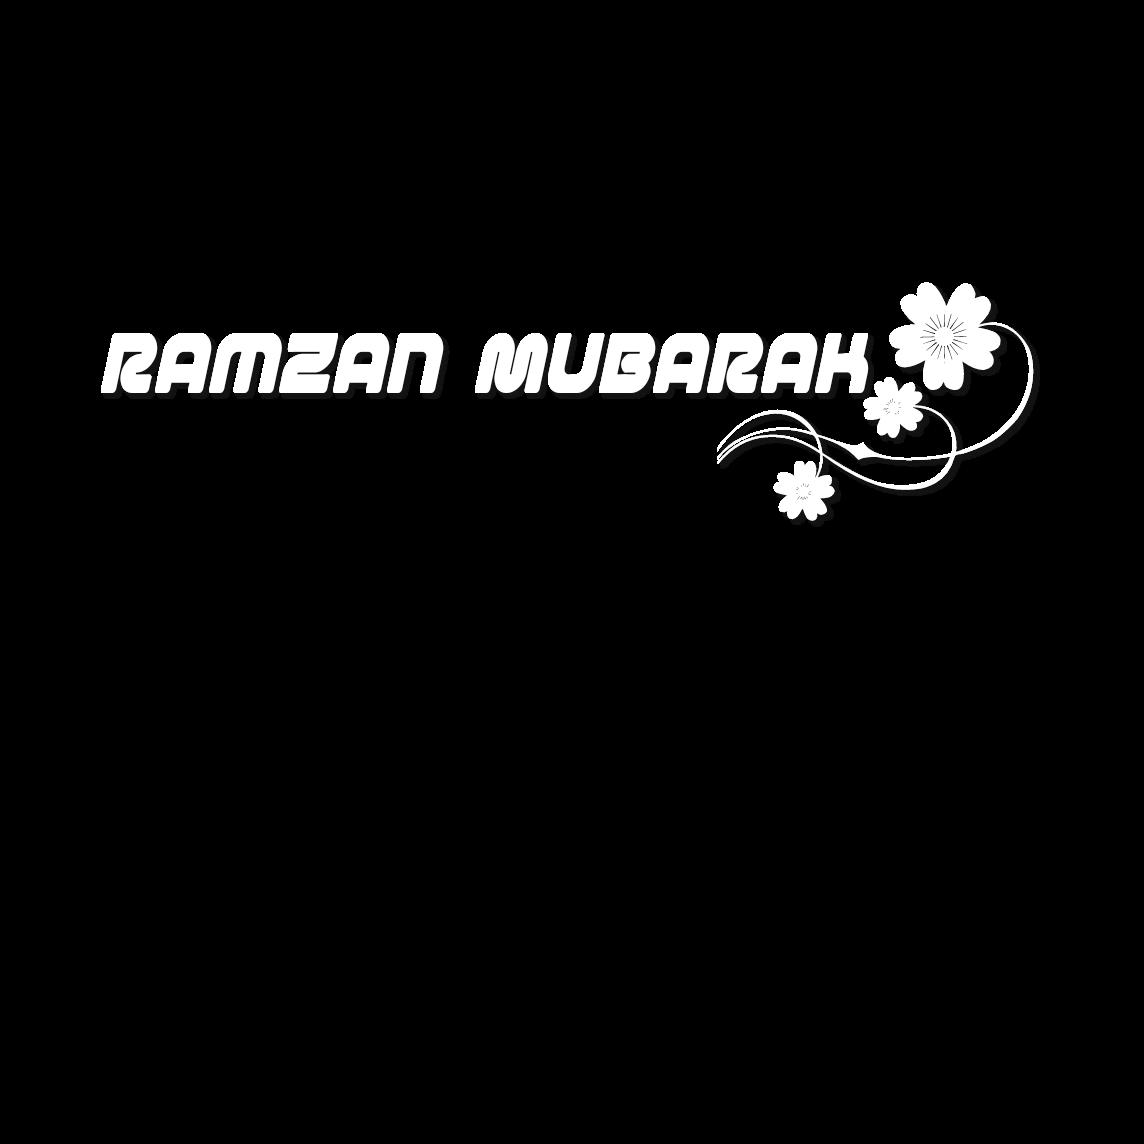 HANIYA ALI EDITING ZONE: RAMZAN MUBARAK PNG TEXT (MADE BY.